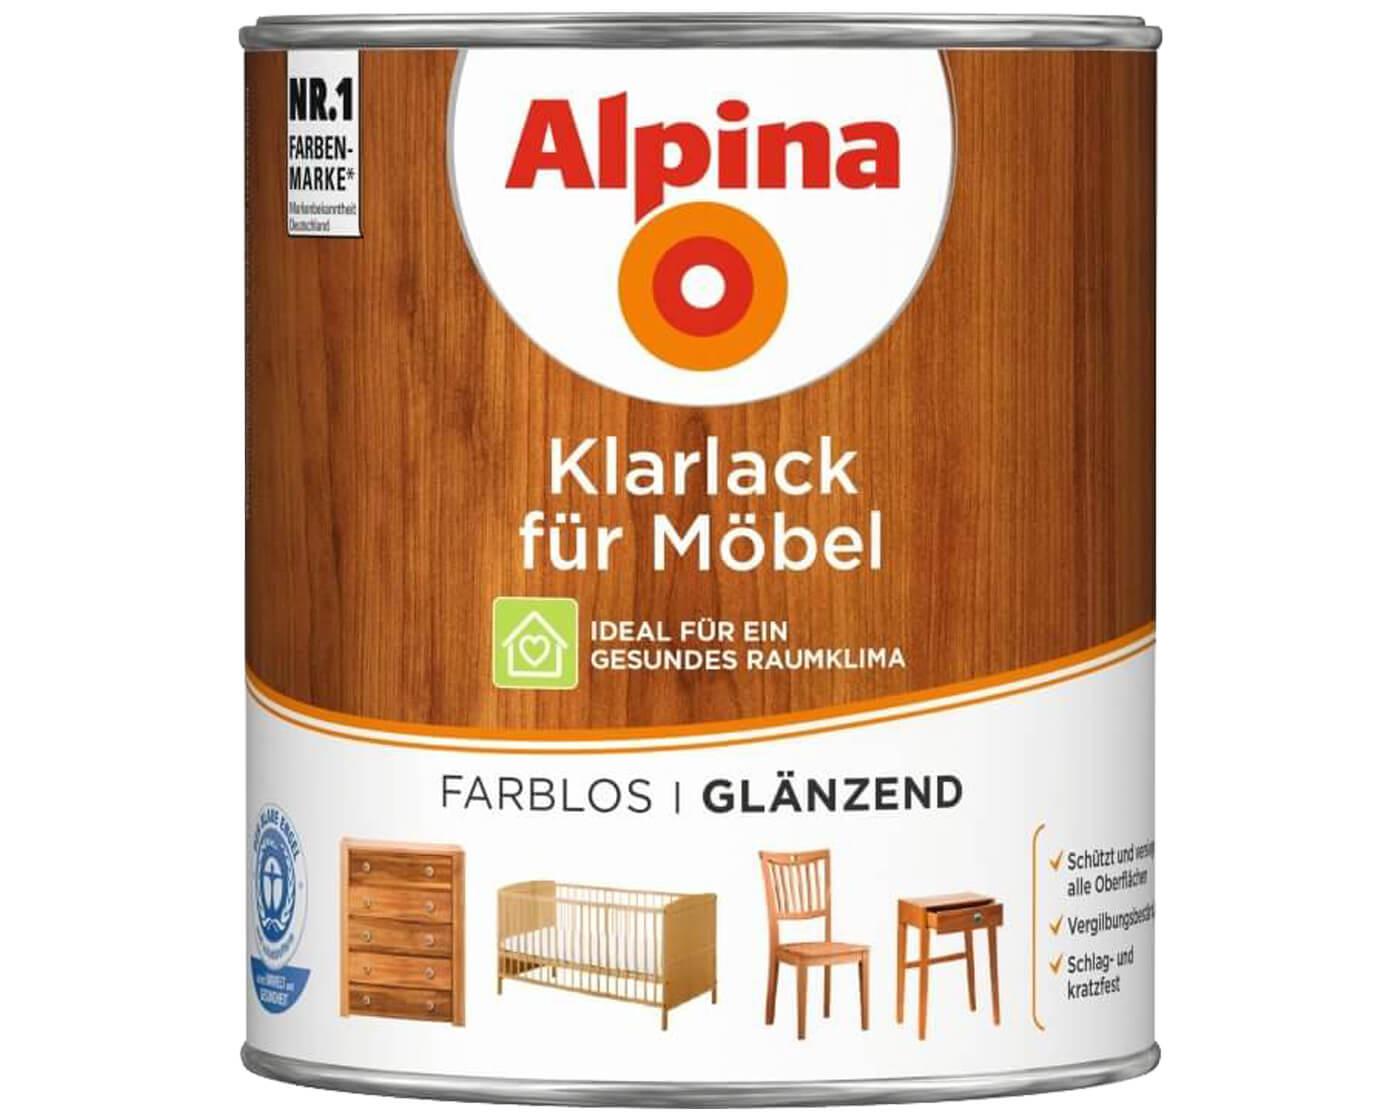 alpina klarlack f r m bel farblos lack grundierung markenbaumarkt24. Black Bedroom Furniture Sets. Home Design Ideas